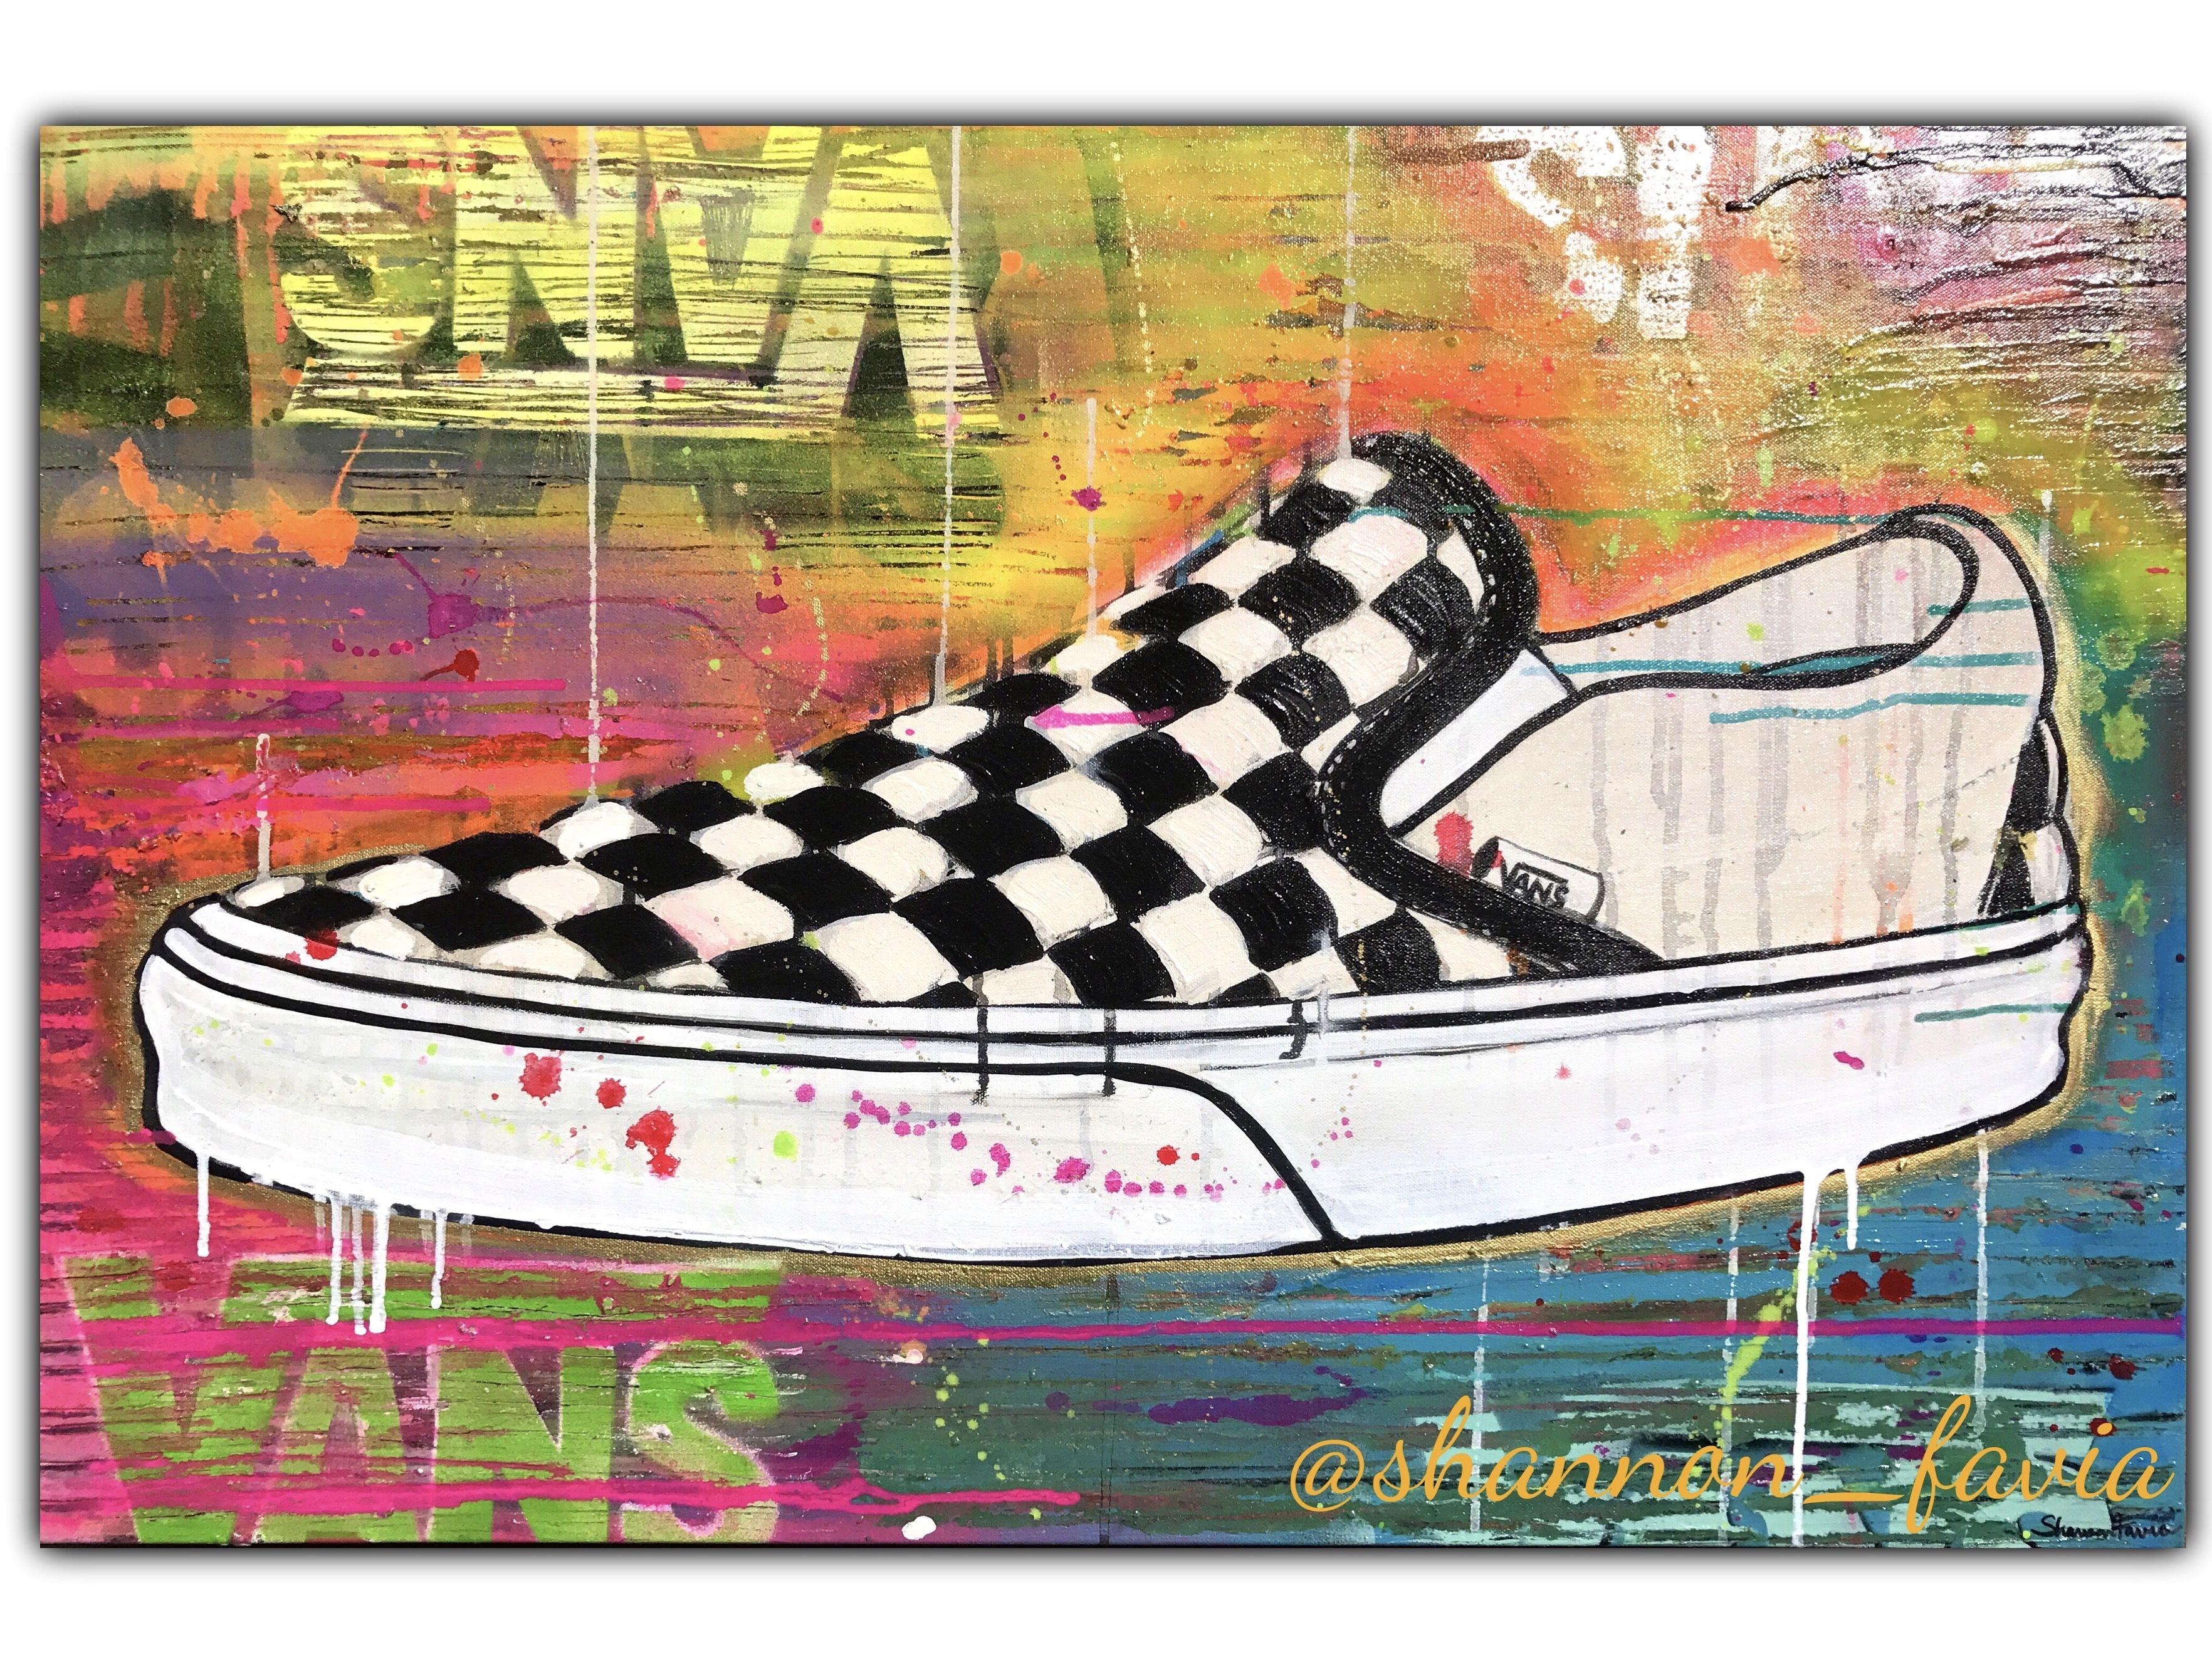 d6205a203c979 Vans sneaker painting. 24